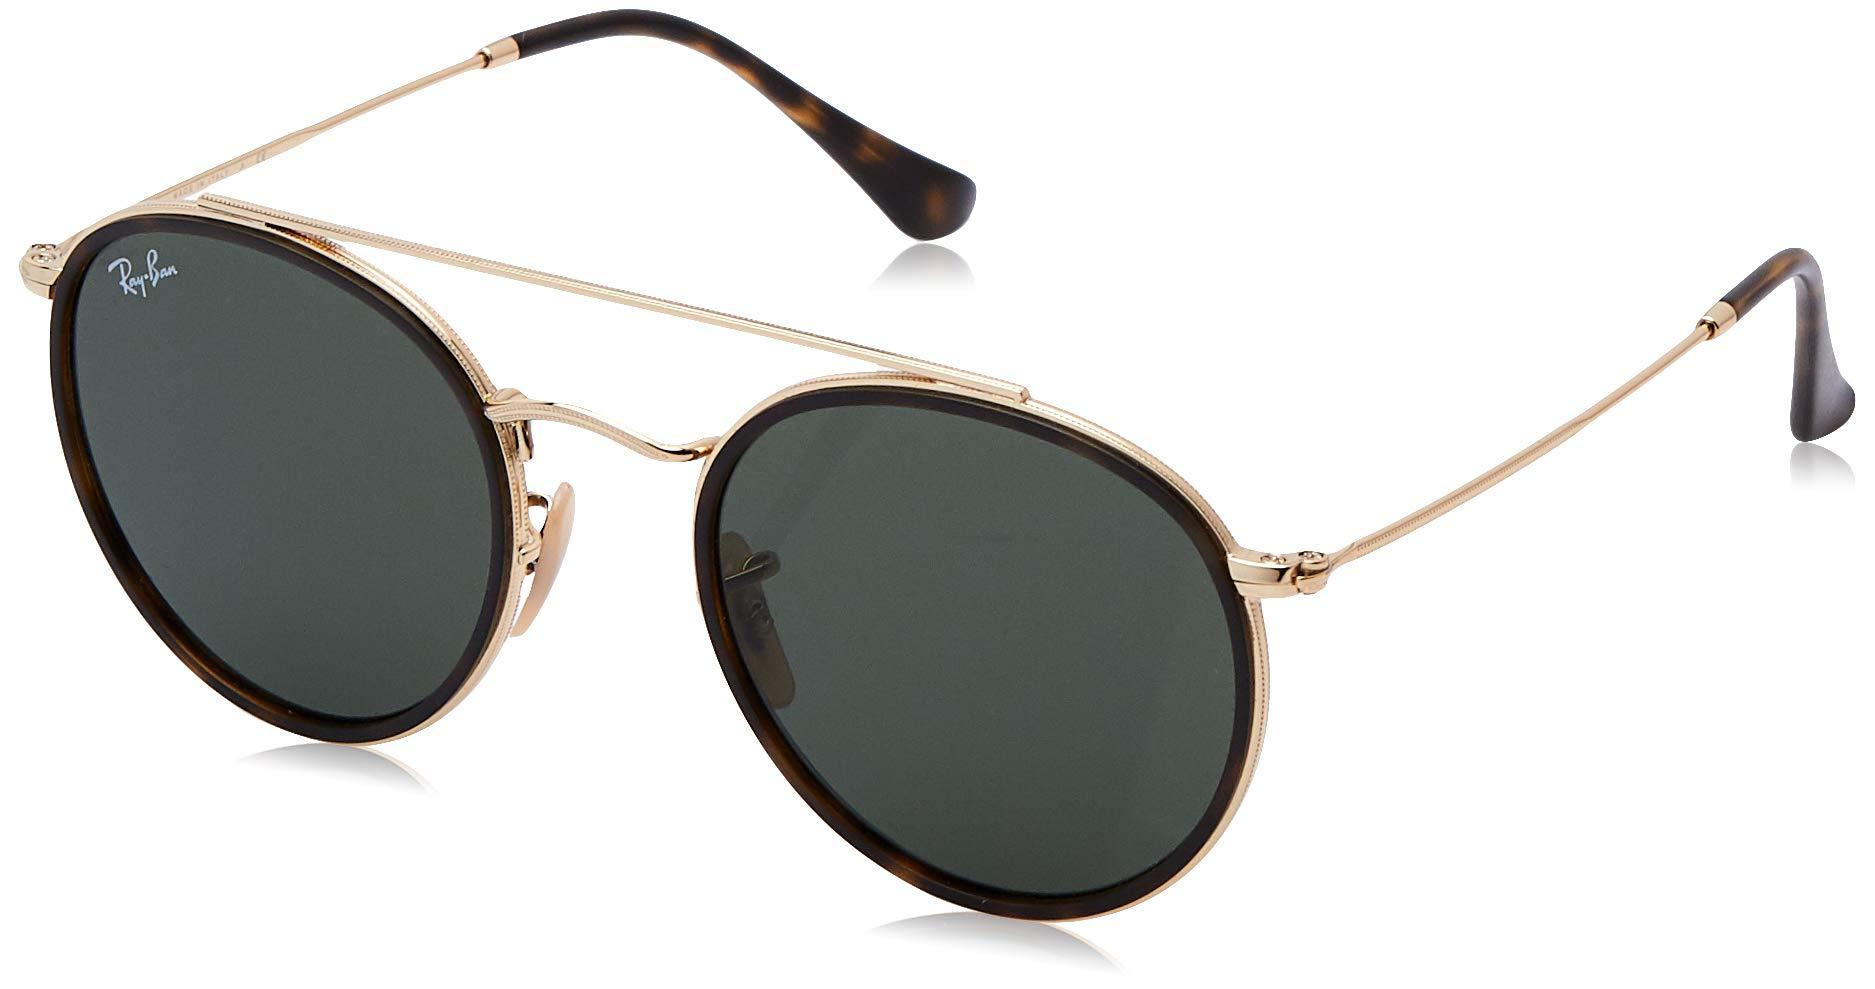 ویکالا · خرید  اصل اورجینال · خرید از آمازون · Ray-Ban RB3647N Round Double Bridge Sunglasses, Gold/Green, 51 mm wekala · ویکالا